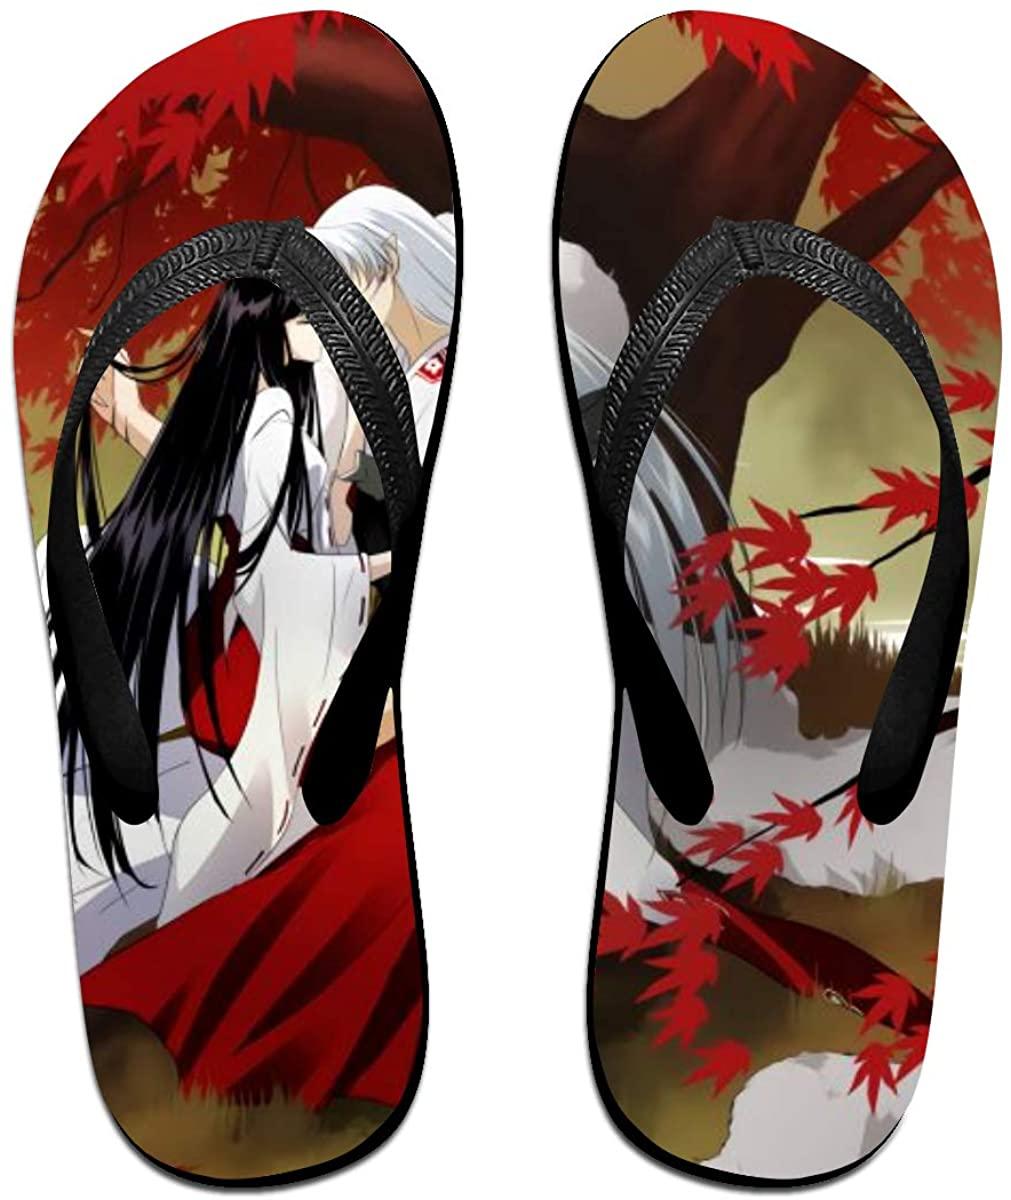 Inuyasha sesshoumaru Anime Flip Flops Beach Sandals Thong Slippers for Indoor Outdoor Bathroom Shower